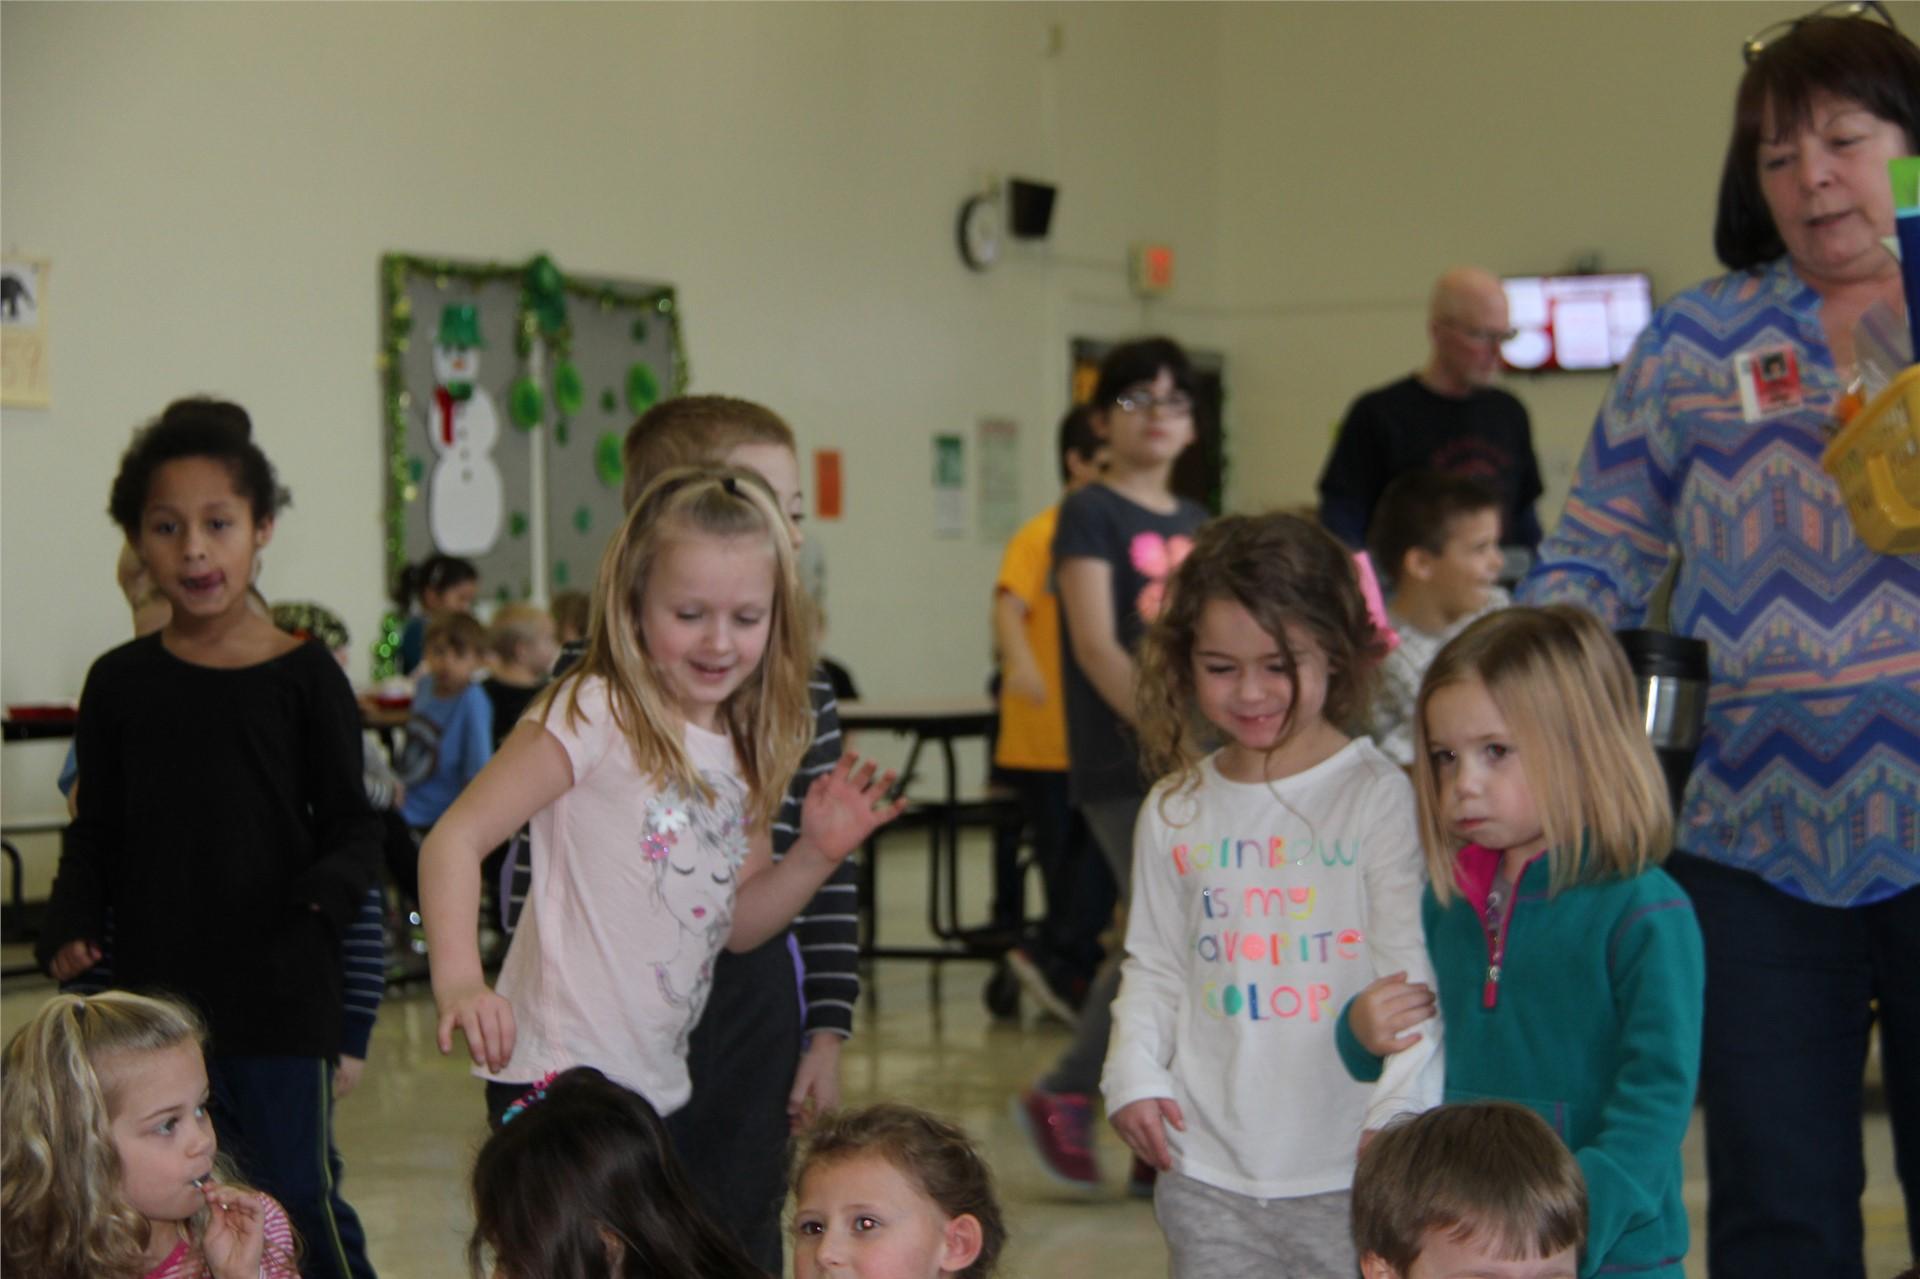 more students dancing